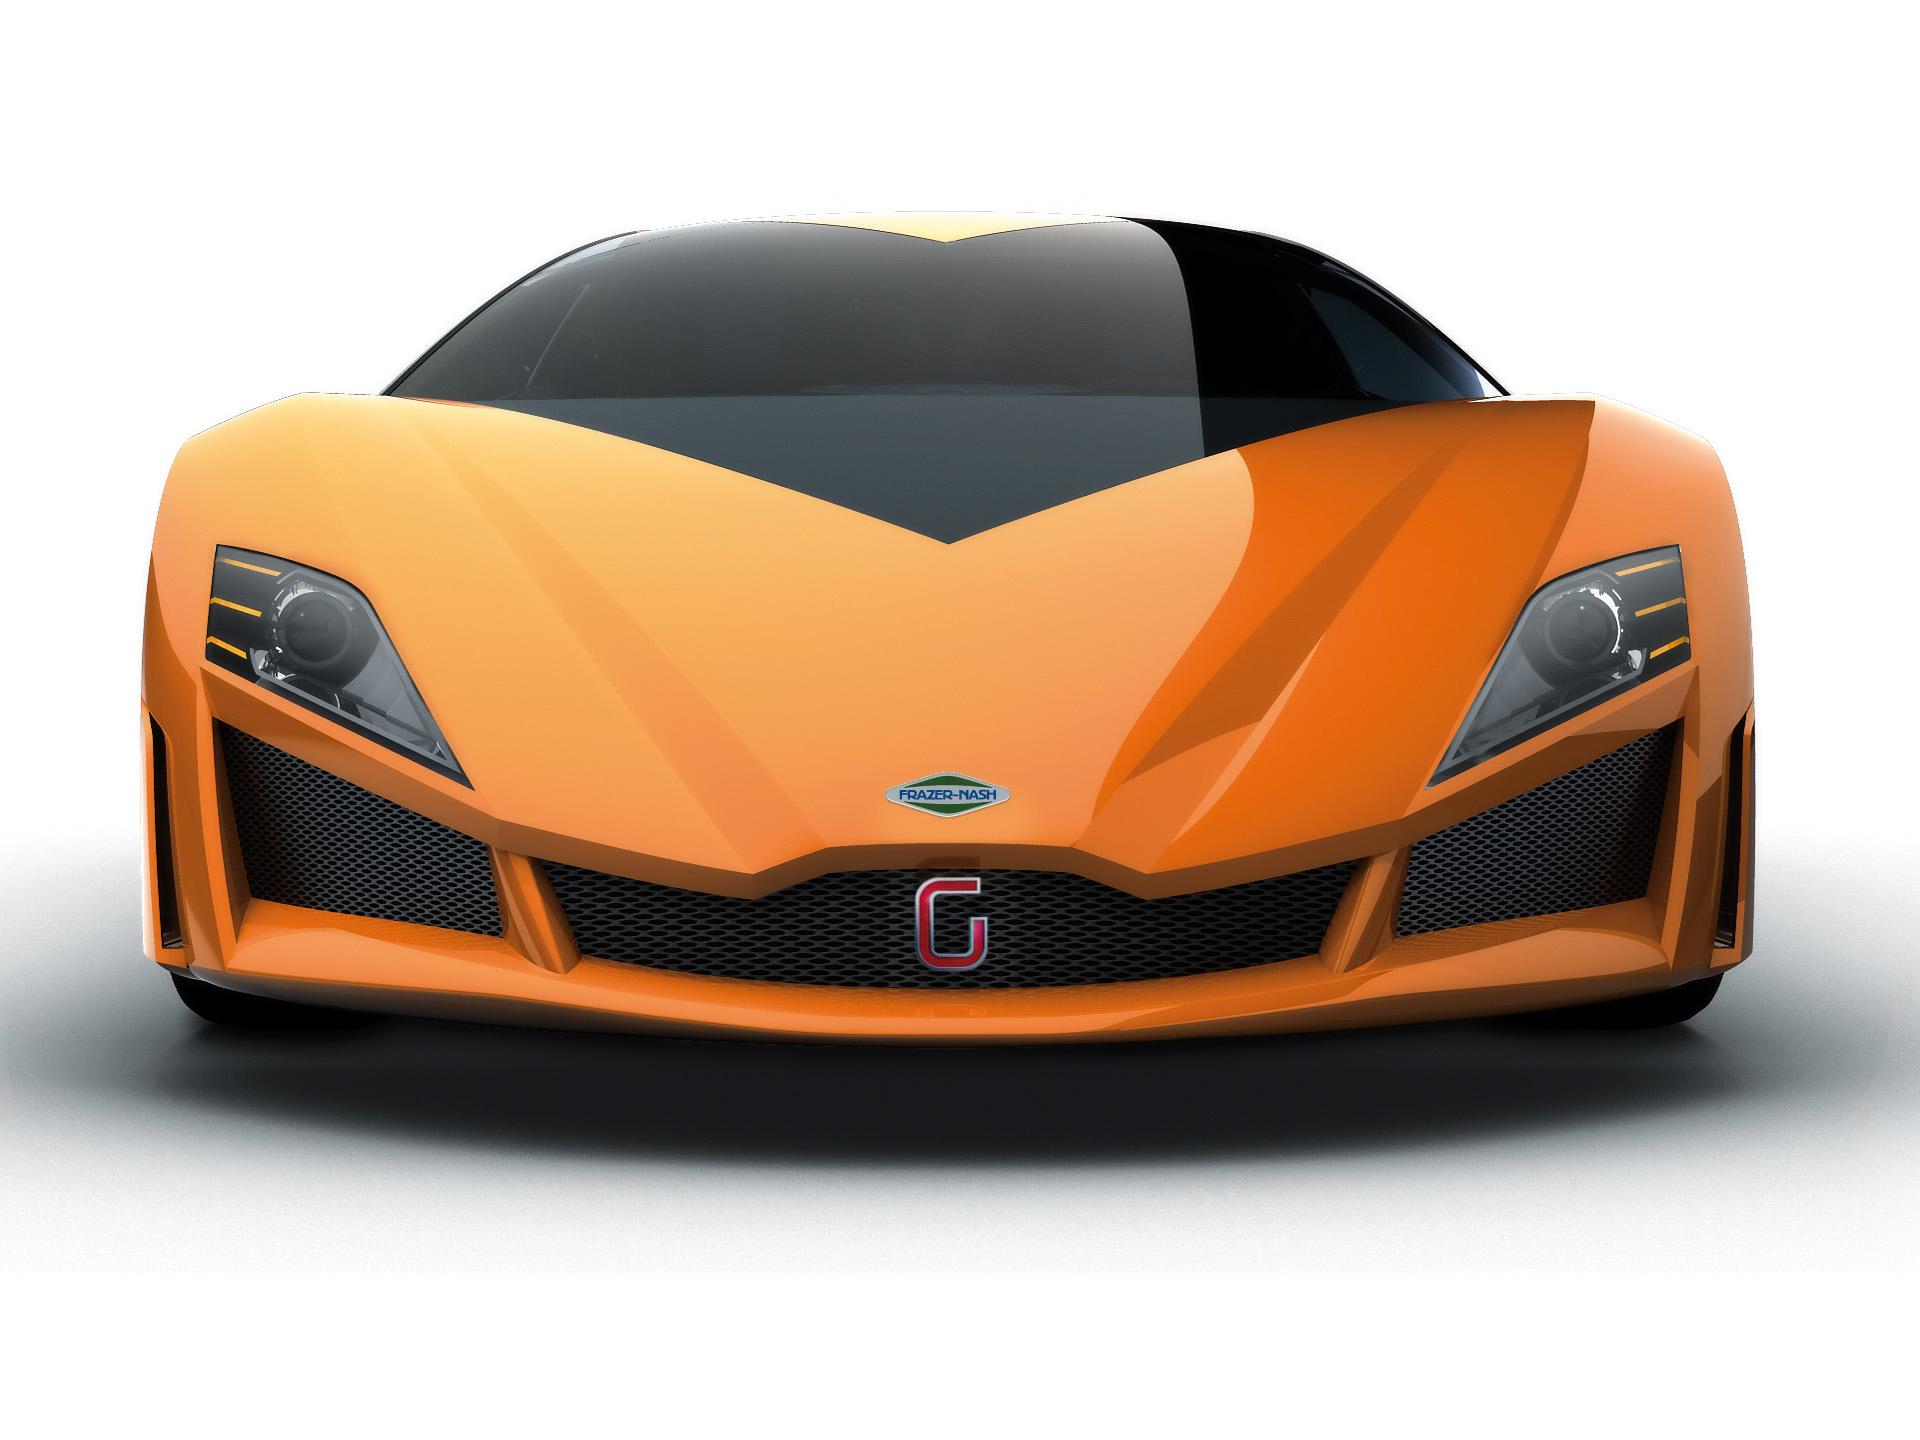 Santa Fe Suv >> Volkswagen to buy Italdesign Giugiaro - photos | CarAdvice